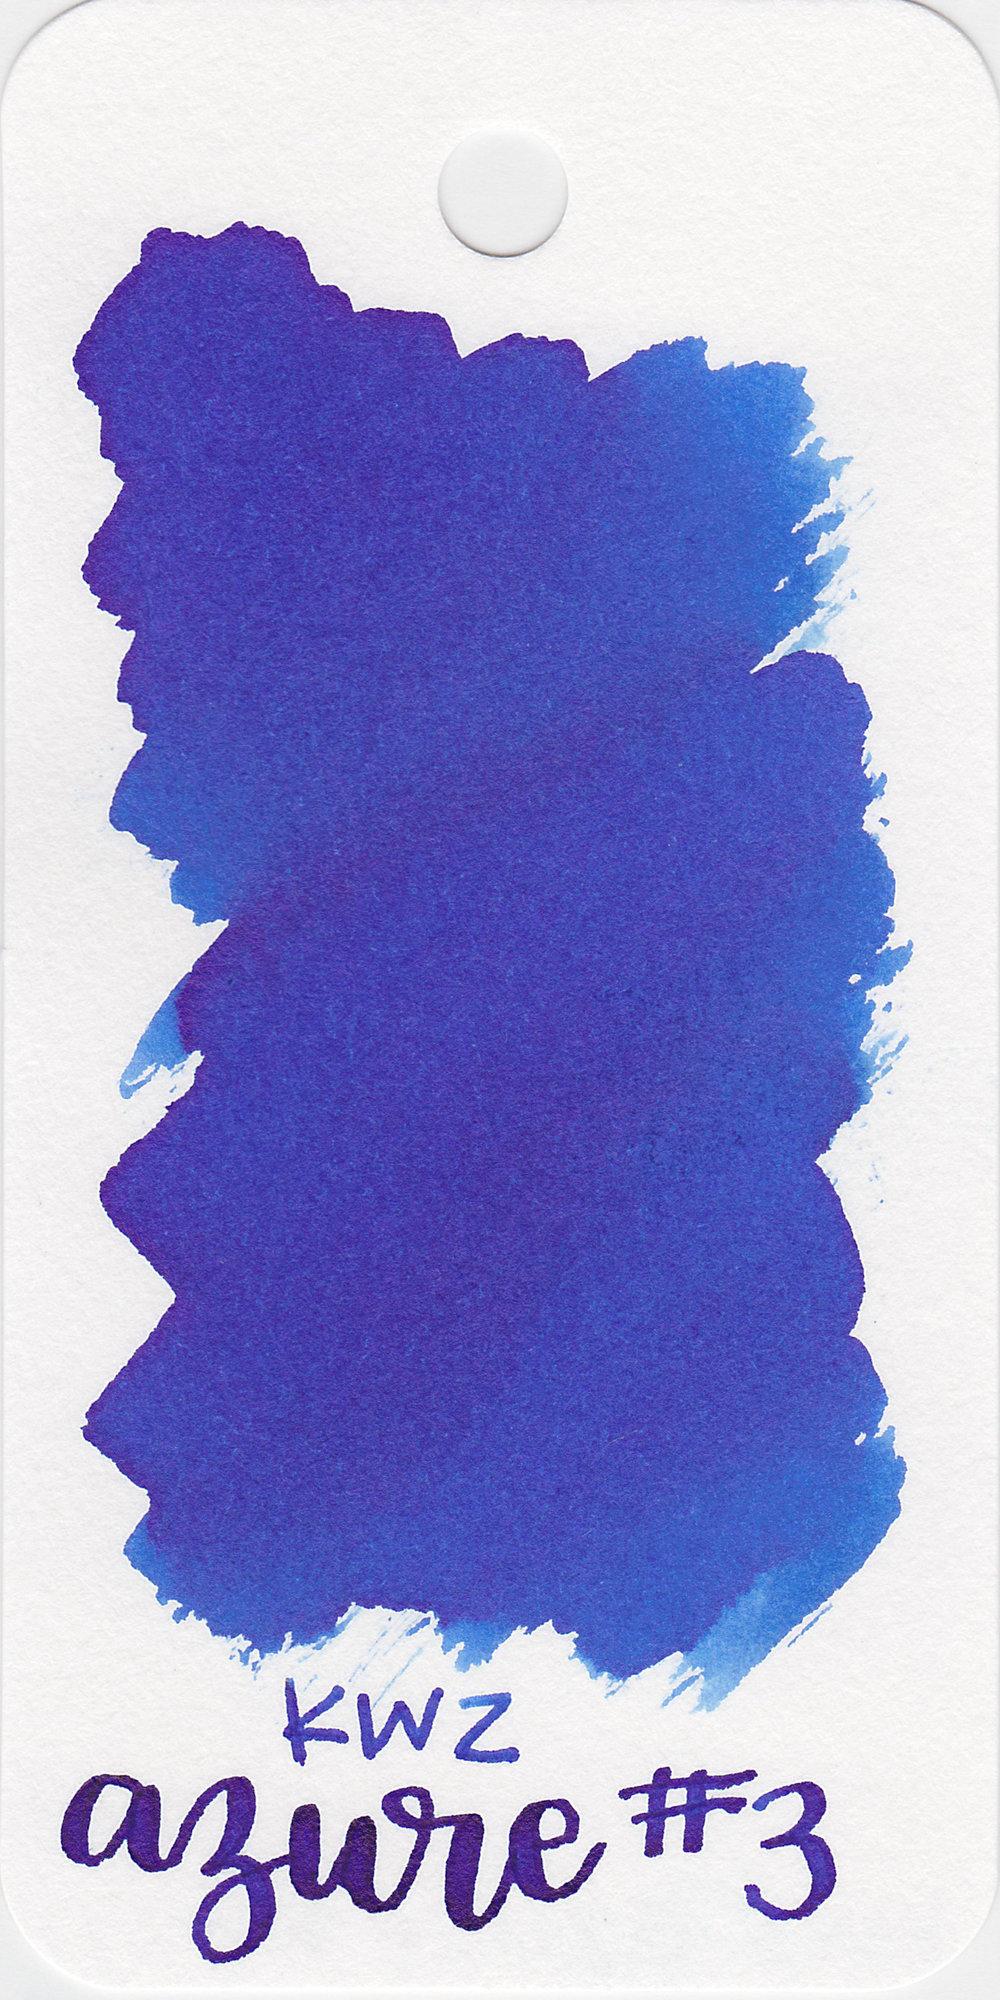 kwz-azure-3-1.jpg